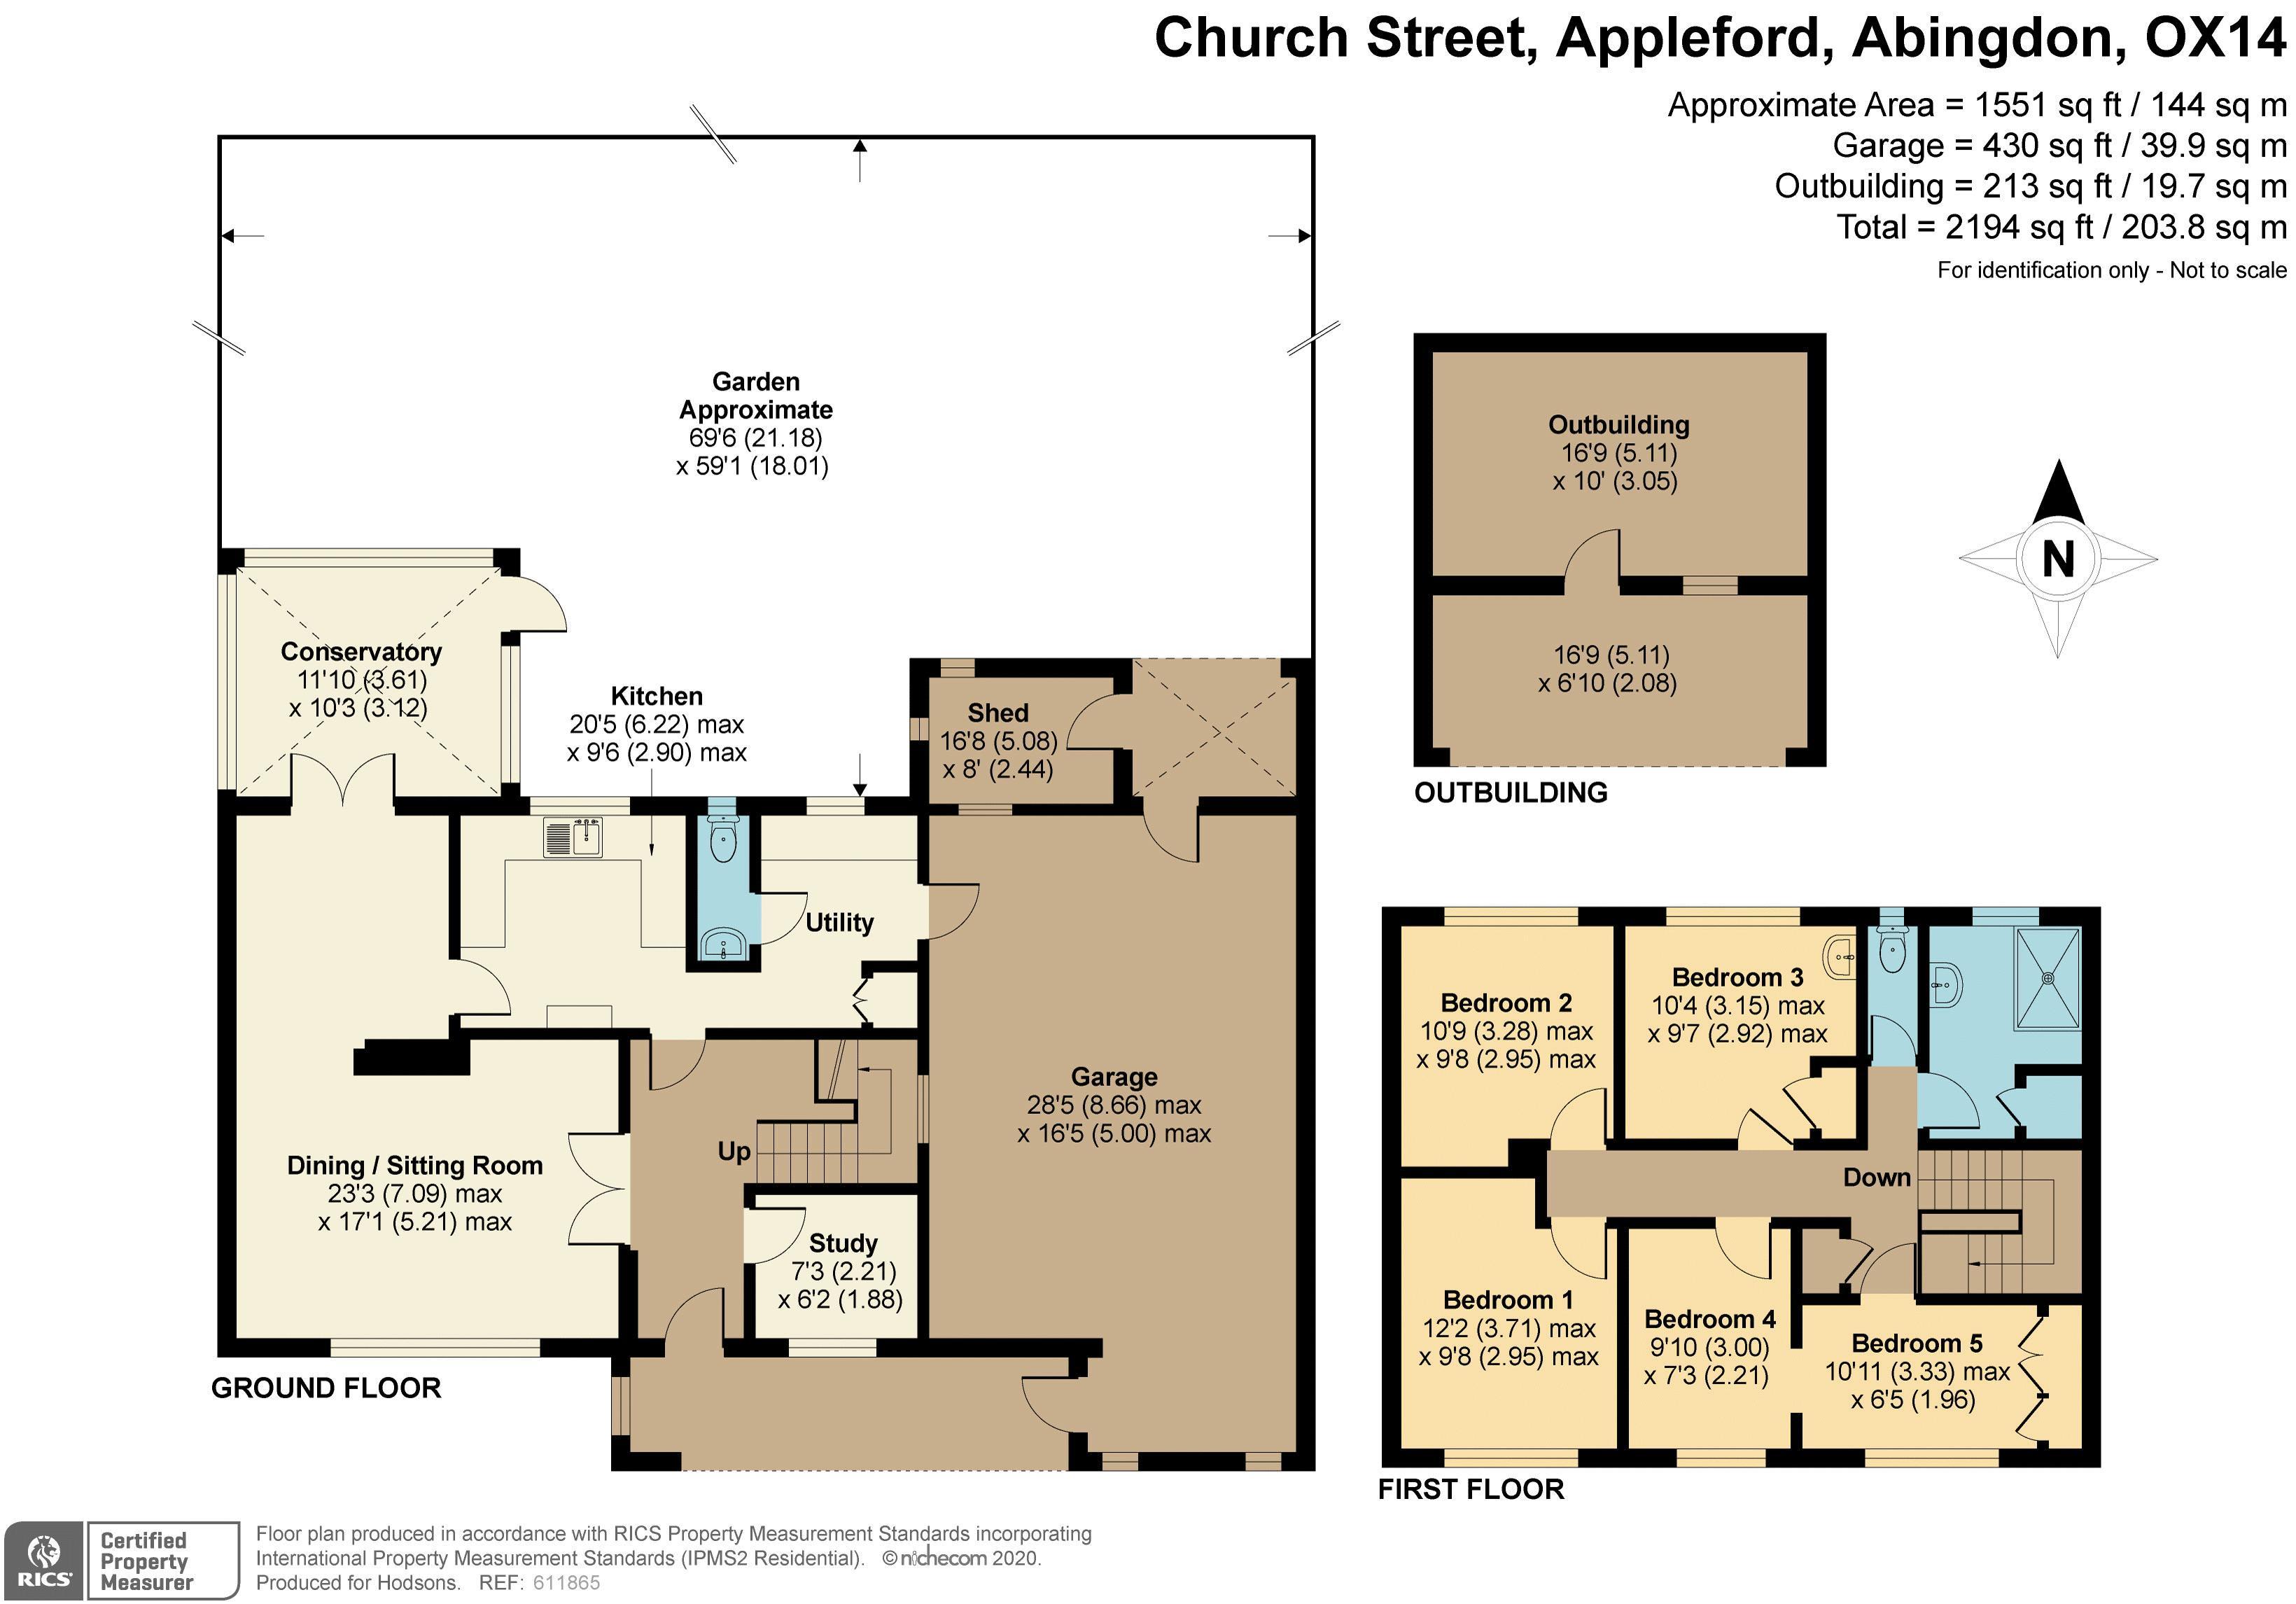 Church Street Appleford